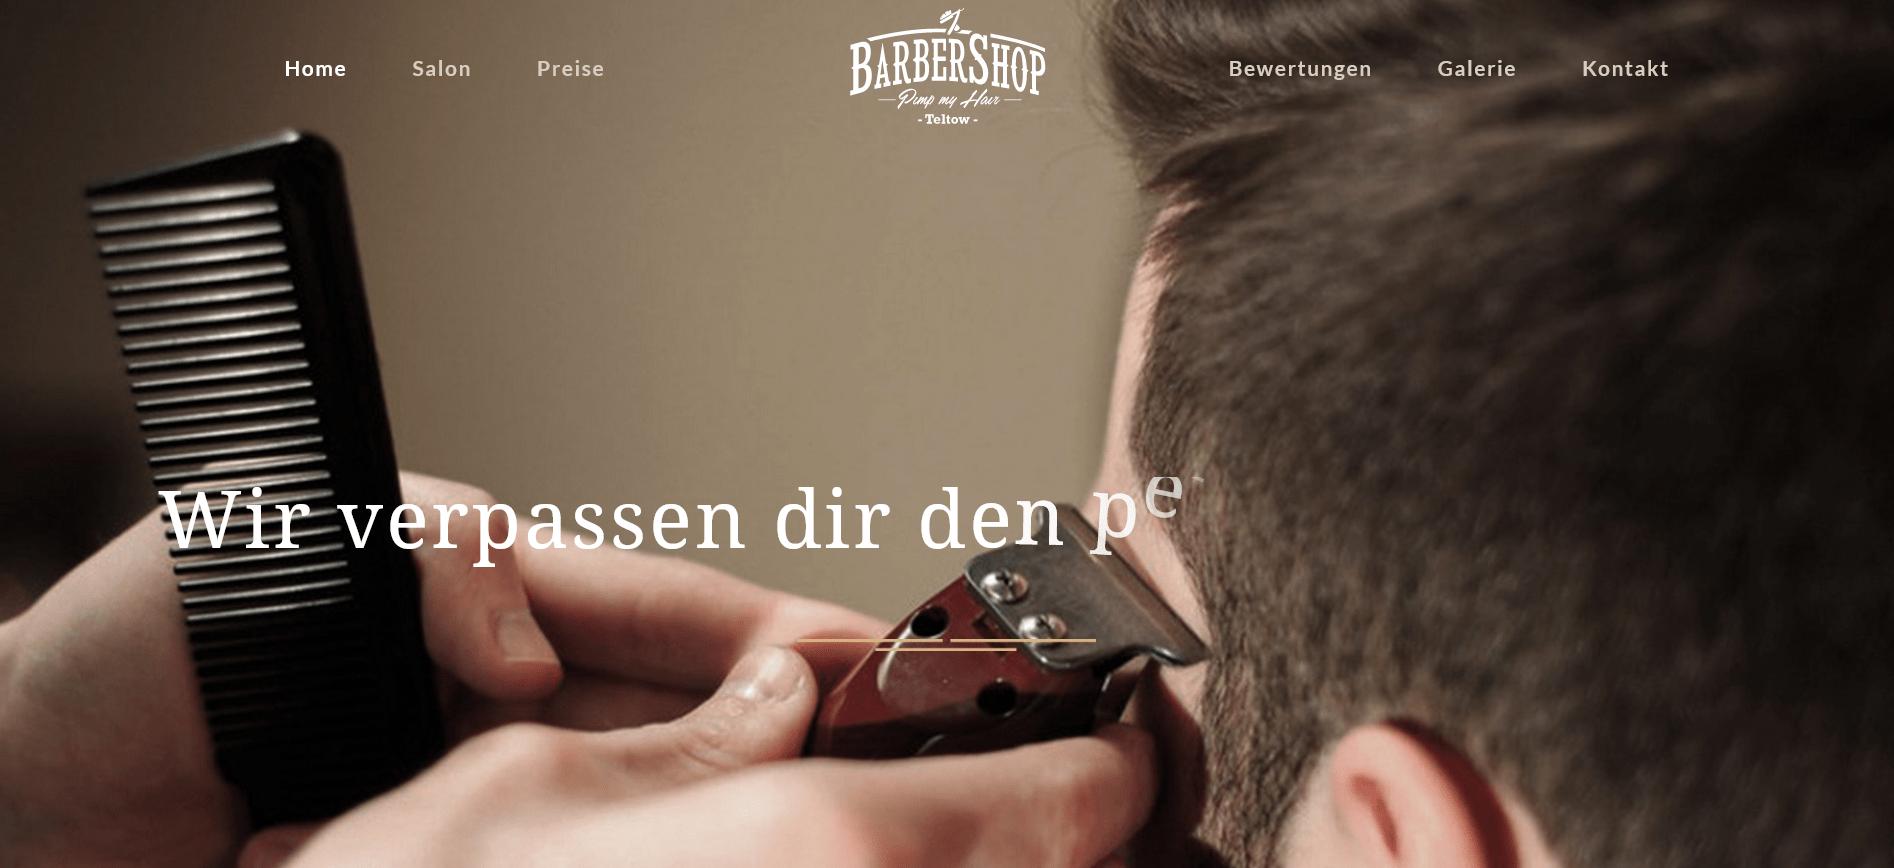 Screenshot_2021-05-06 Home - Barbershop